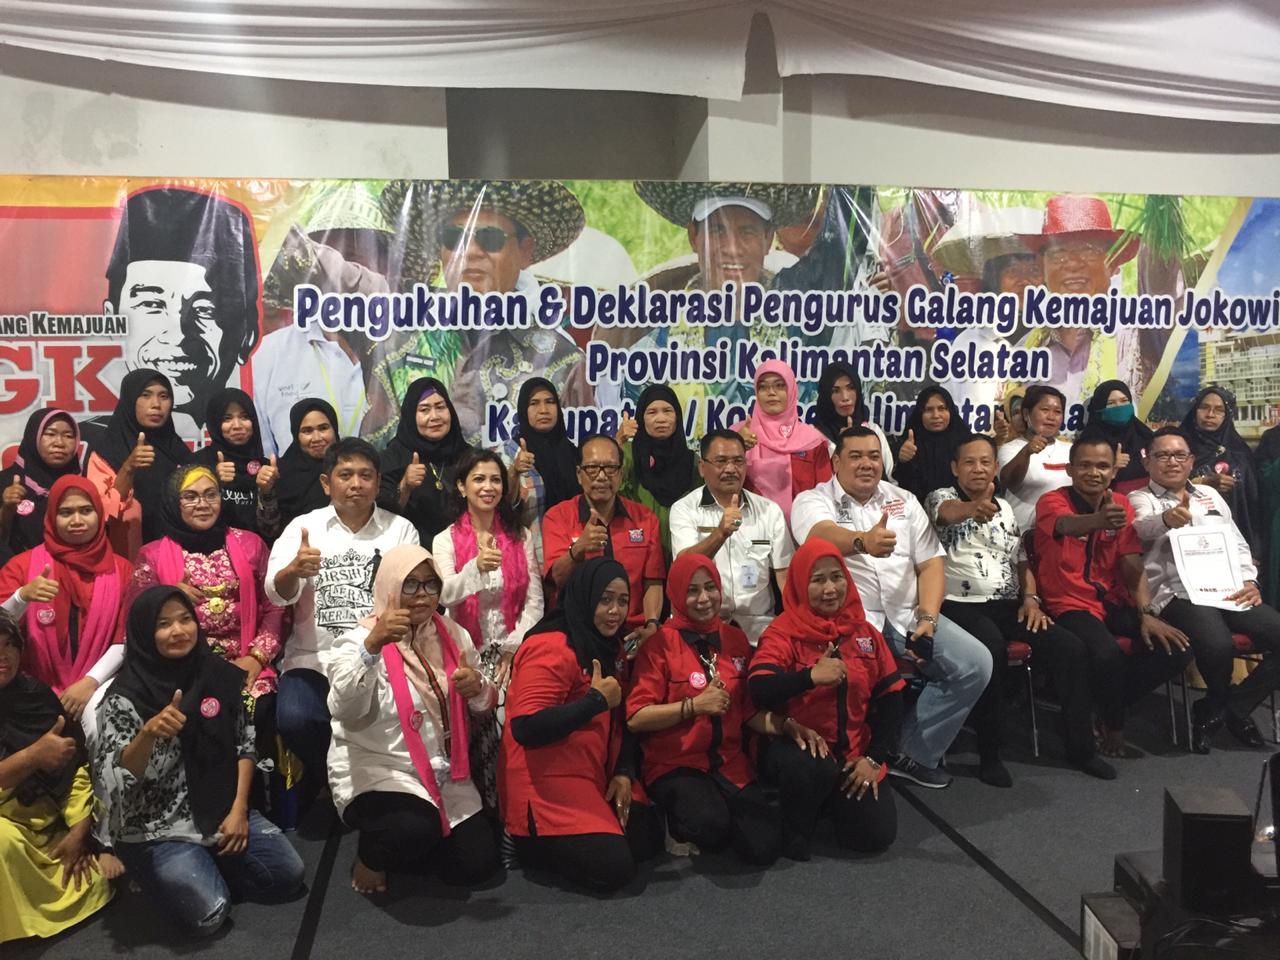 Relawan GK Jokowi Kalsel dan GK Ladies Dideklarasikan